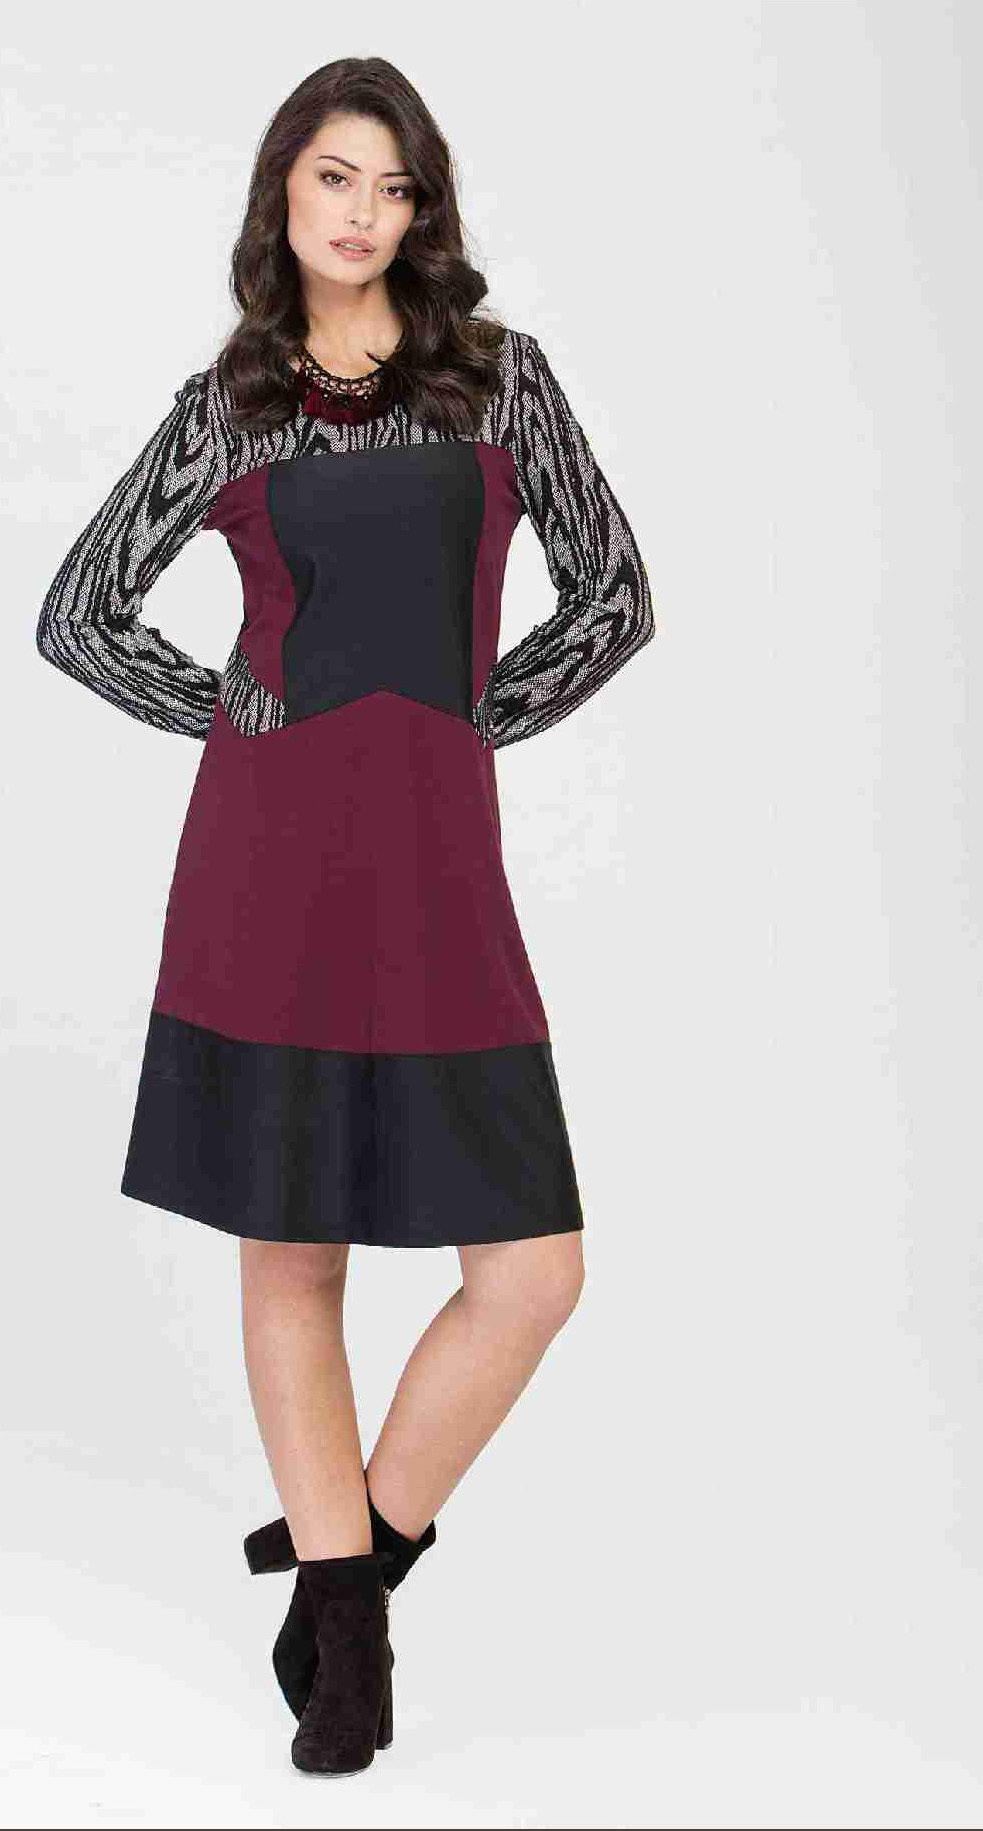 Maloka: Diamond Bodice Jacquard Dress (2 Left!) MK_GYDA_N3